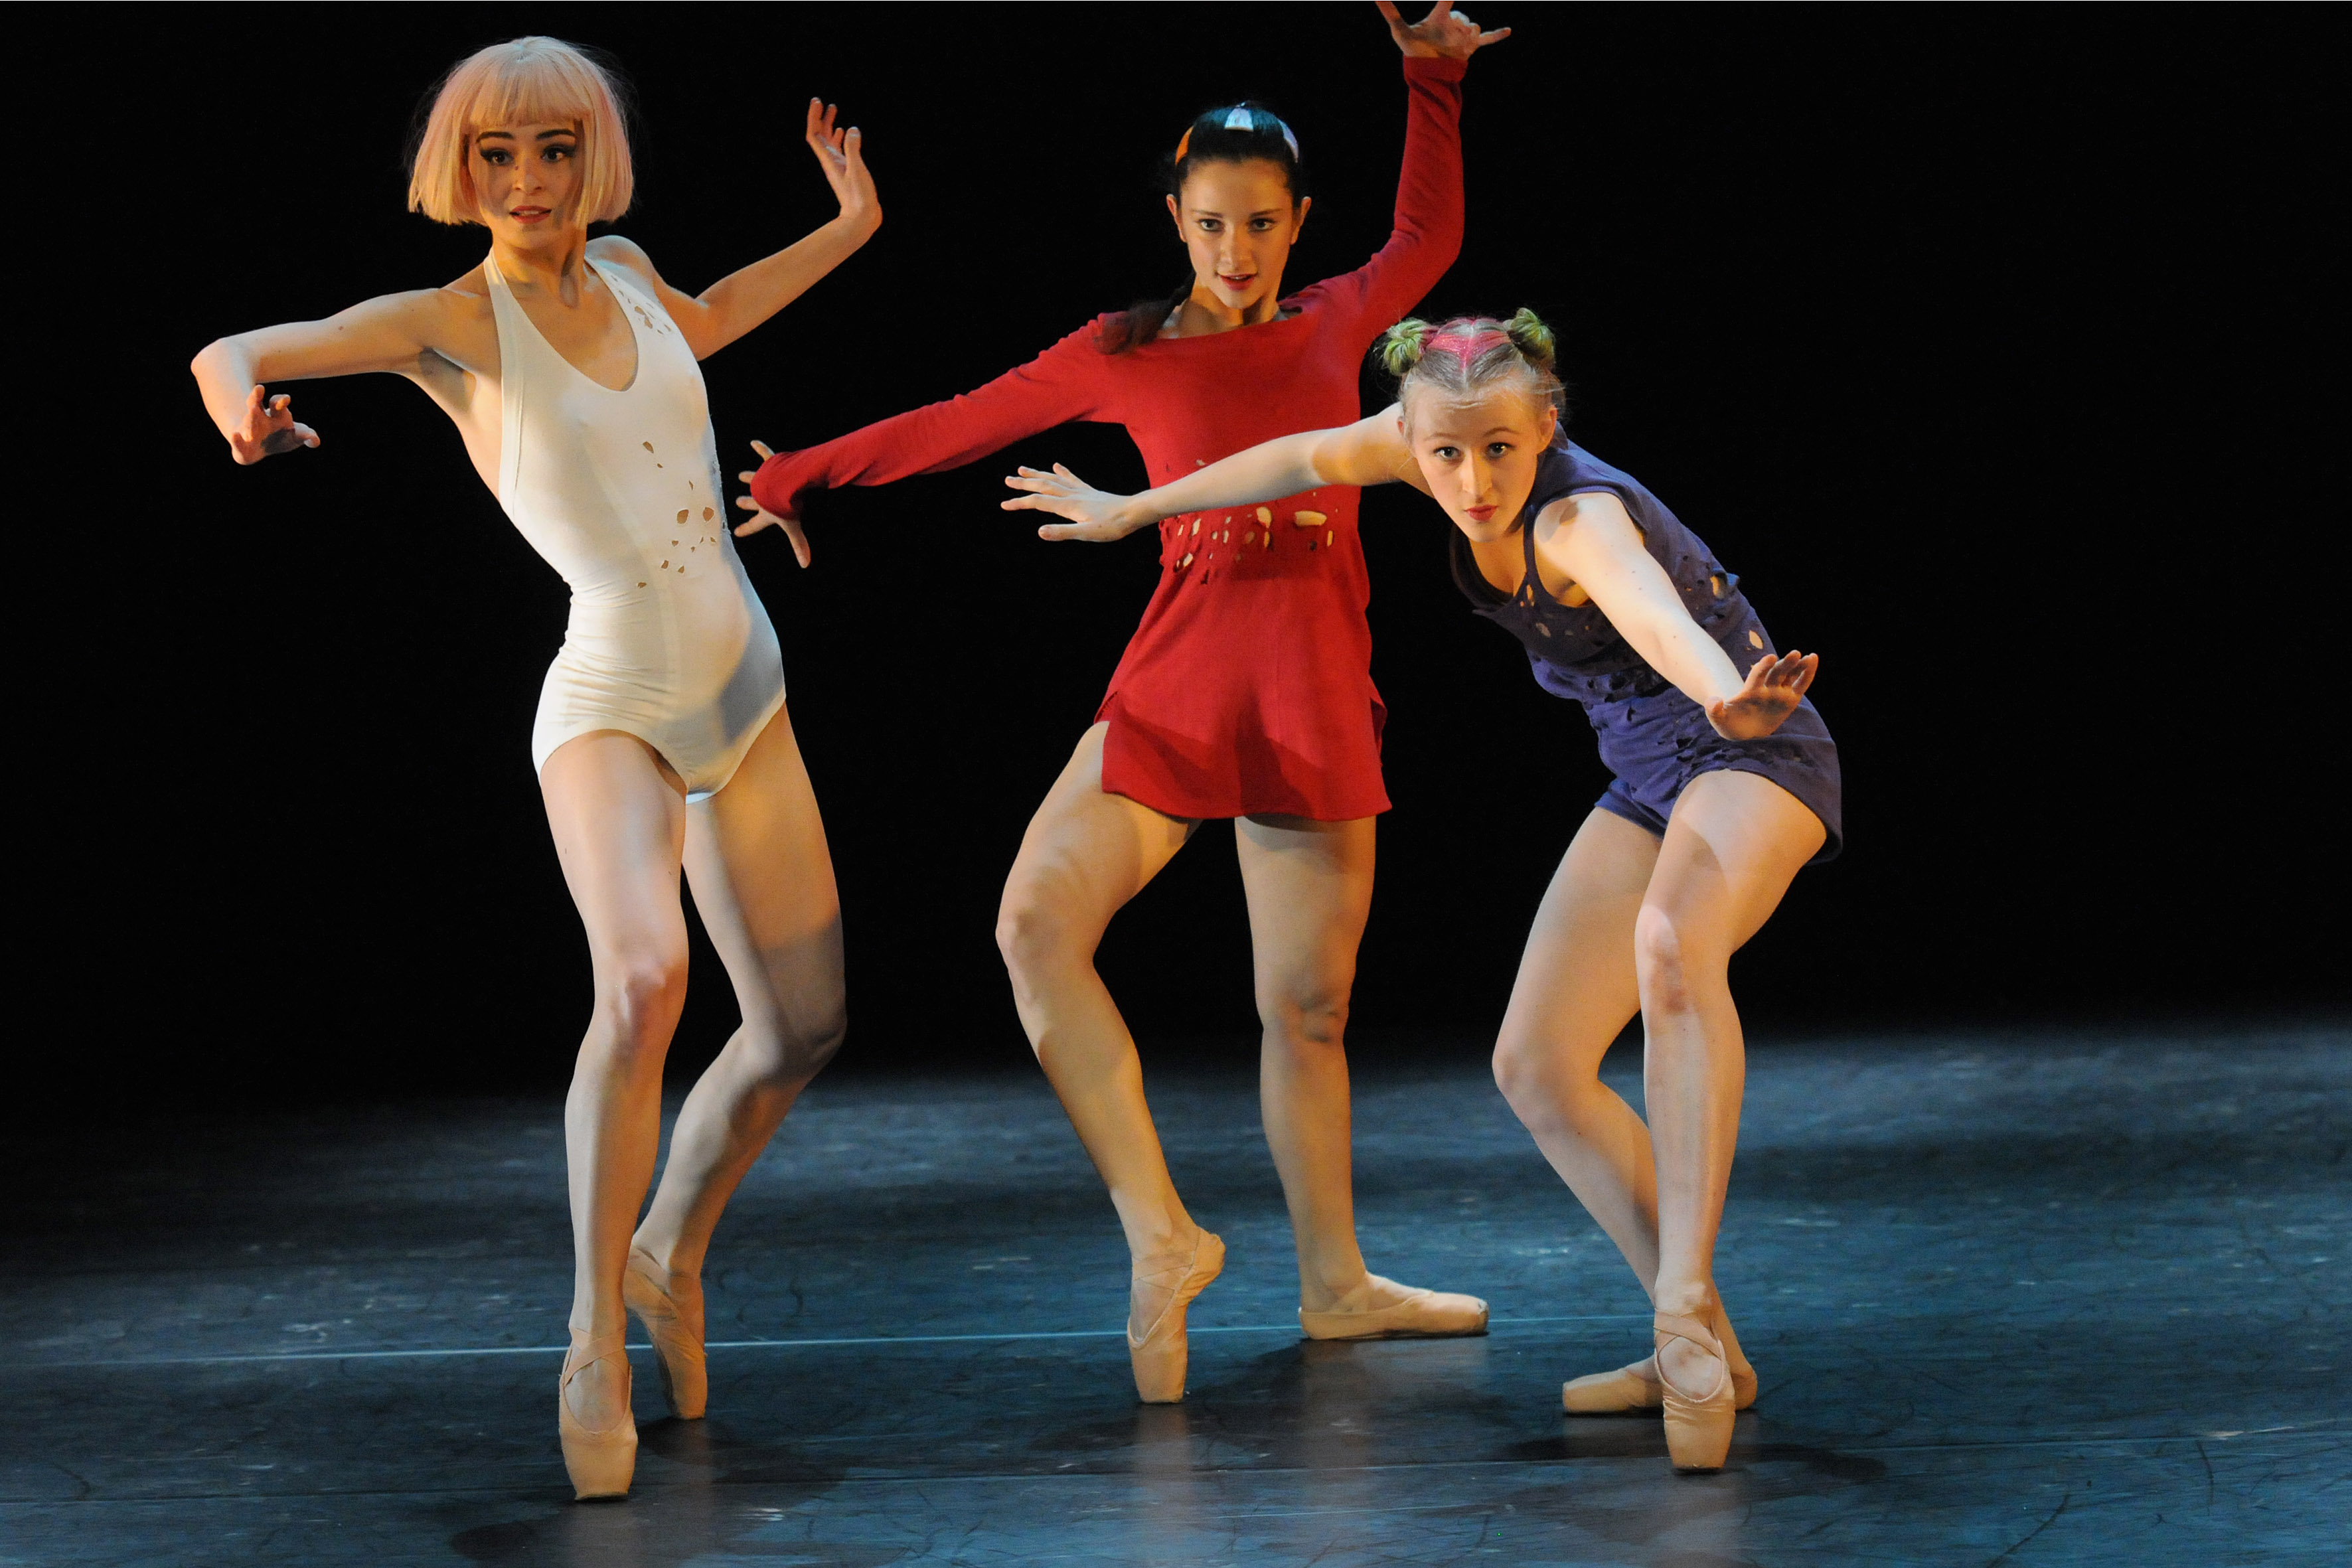 04-Vybz_Ballet-F.Chaignaud_C.Bengolea-4842-1464122076.jpg